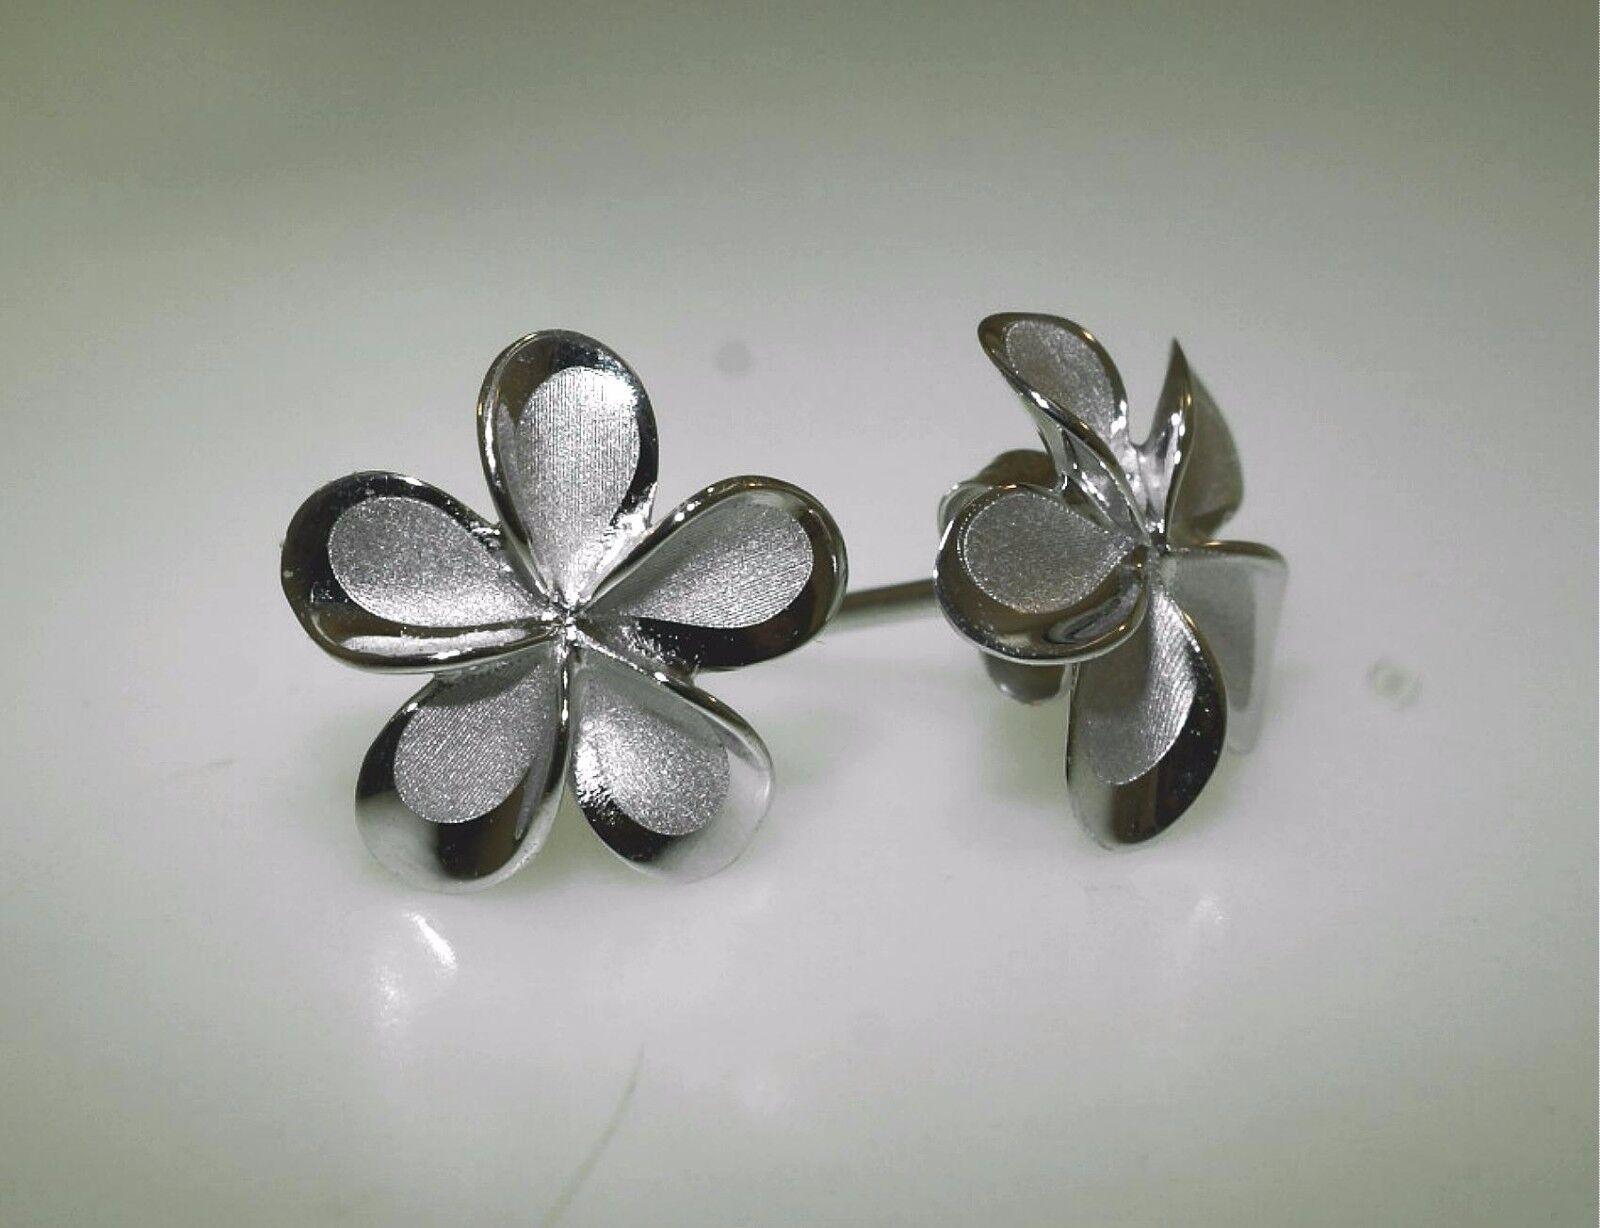 11mm Hawaiian Solid 14k White gold Brushed Satin Fancy Plumeria Stud Earrings